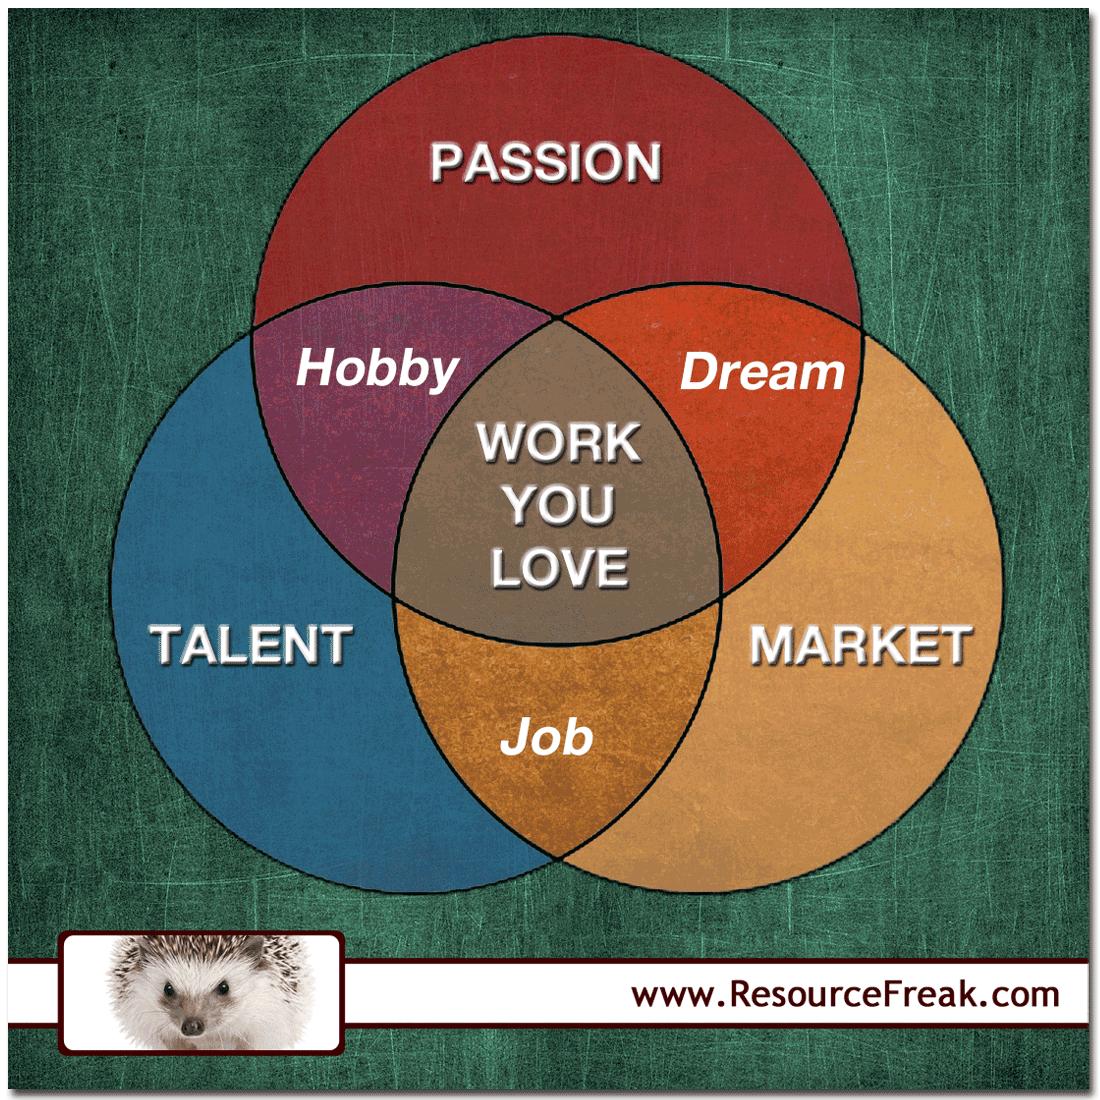 job passion tk job passion 23 04 2017